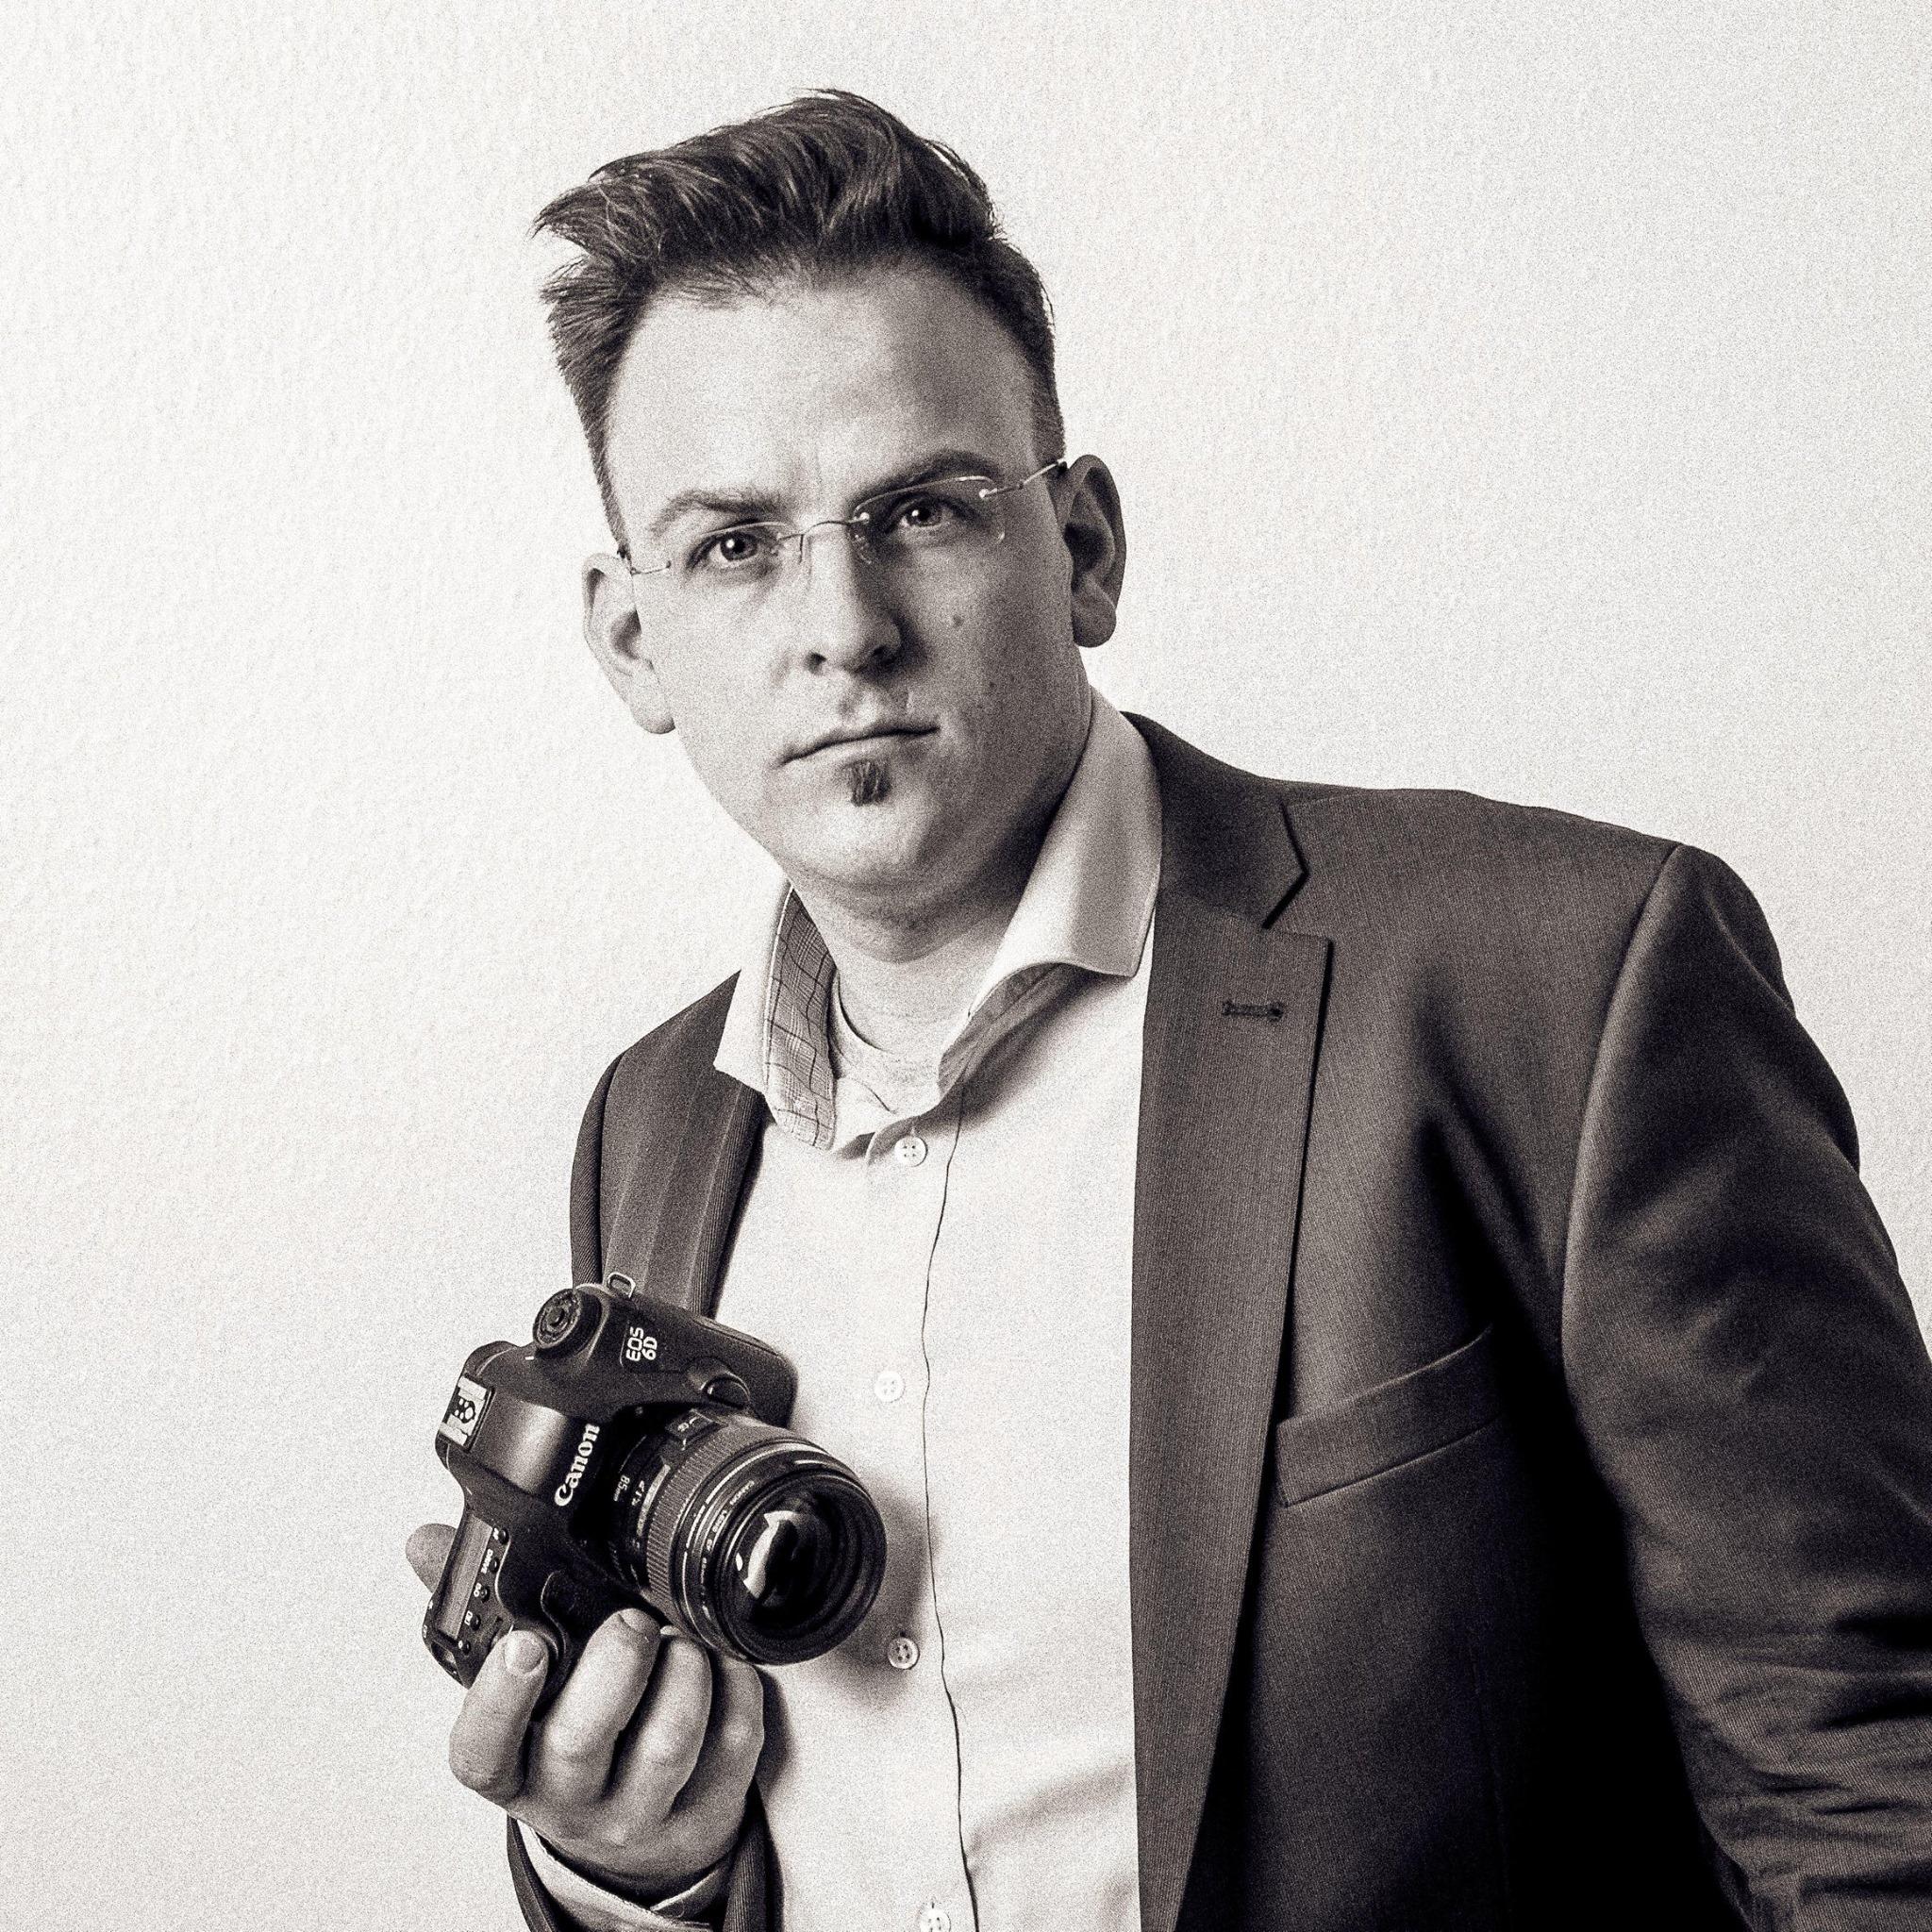 FOTOSTUDIO HARBURG